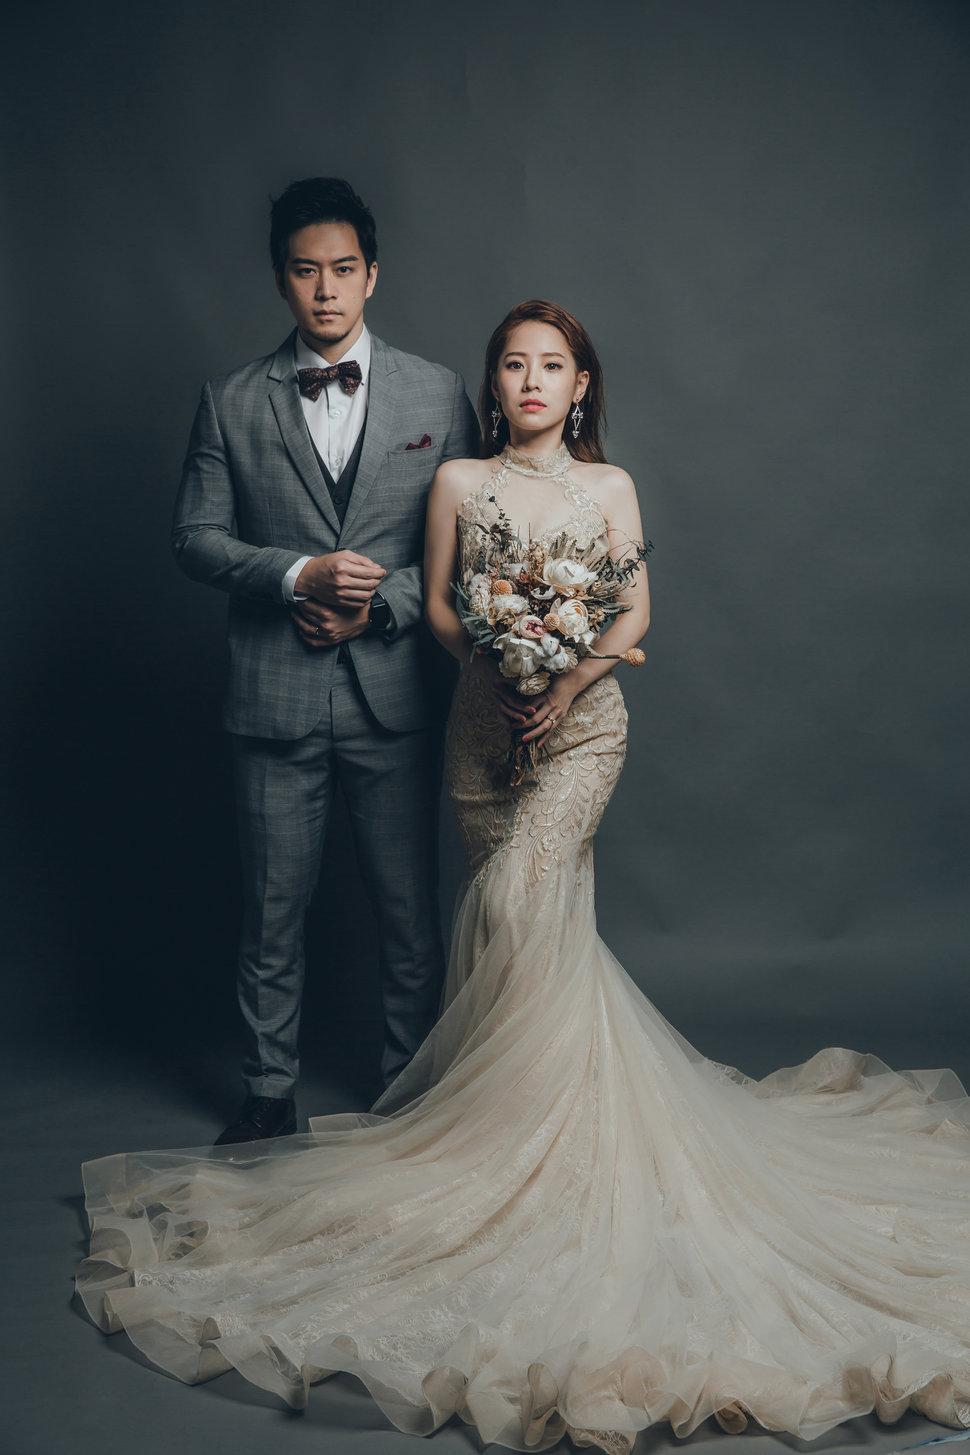 Prewedding-485 - ilian藍專業彩妝造型《結婚吧》